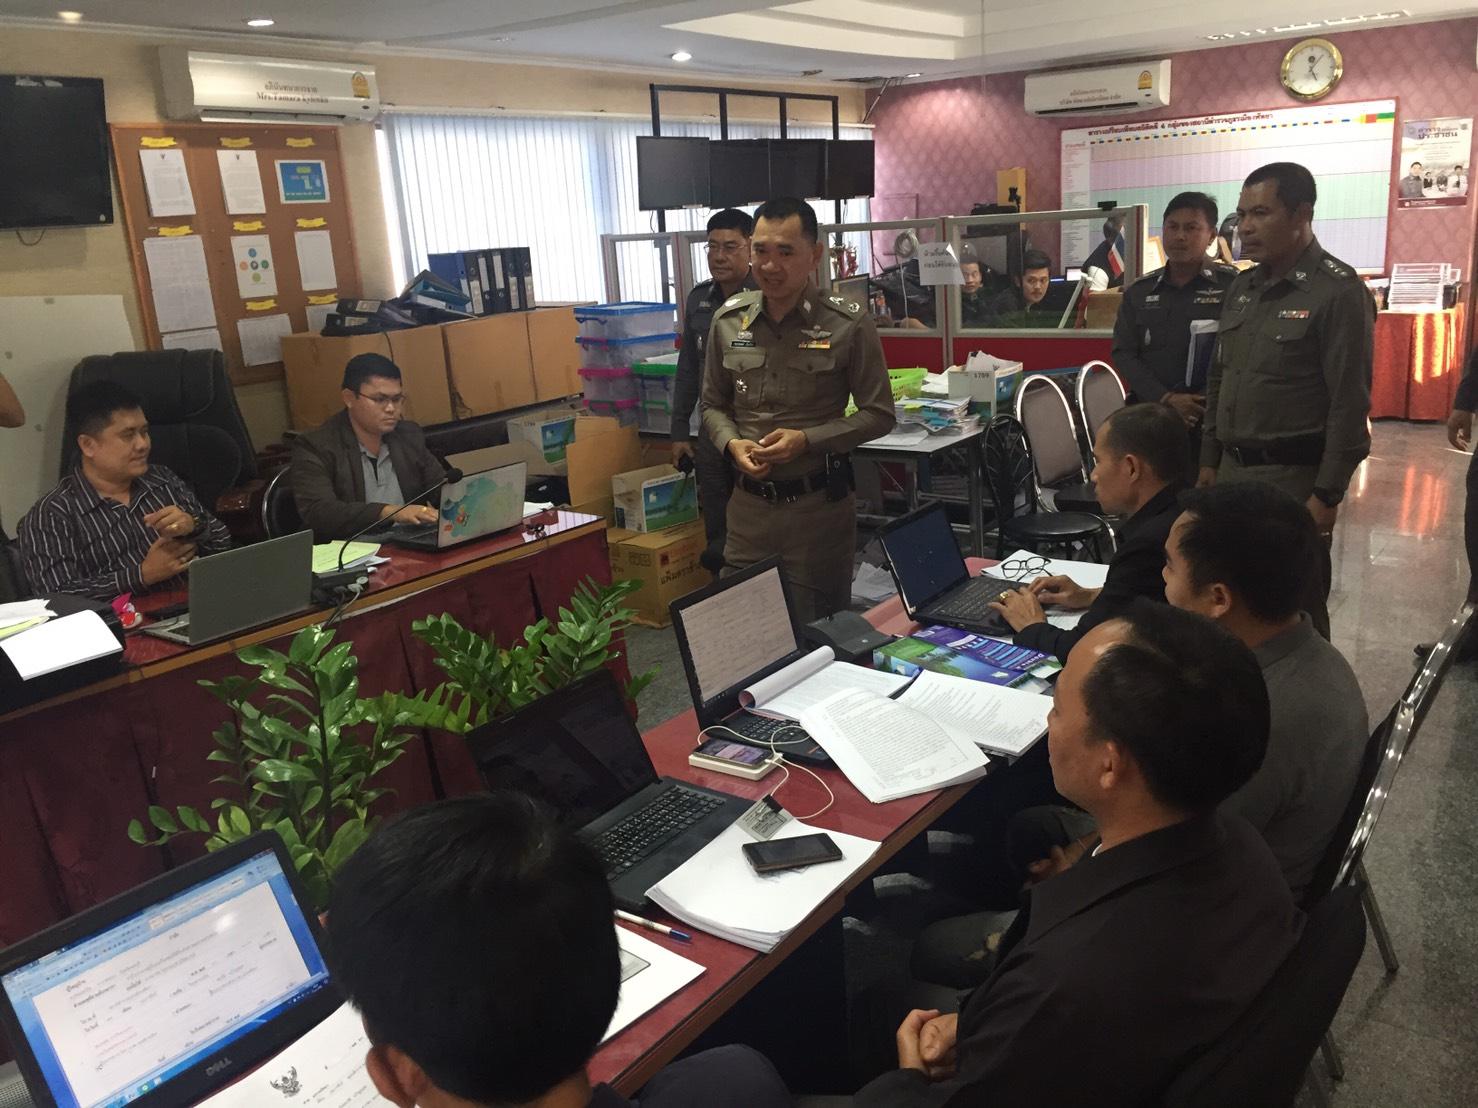 Maj. Gen. Somprasong Yentuam, commander of Chonburi Police, Addresses the force during his recent inspection visit to Pattaya.